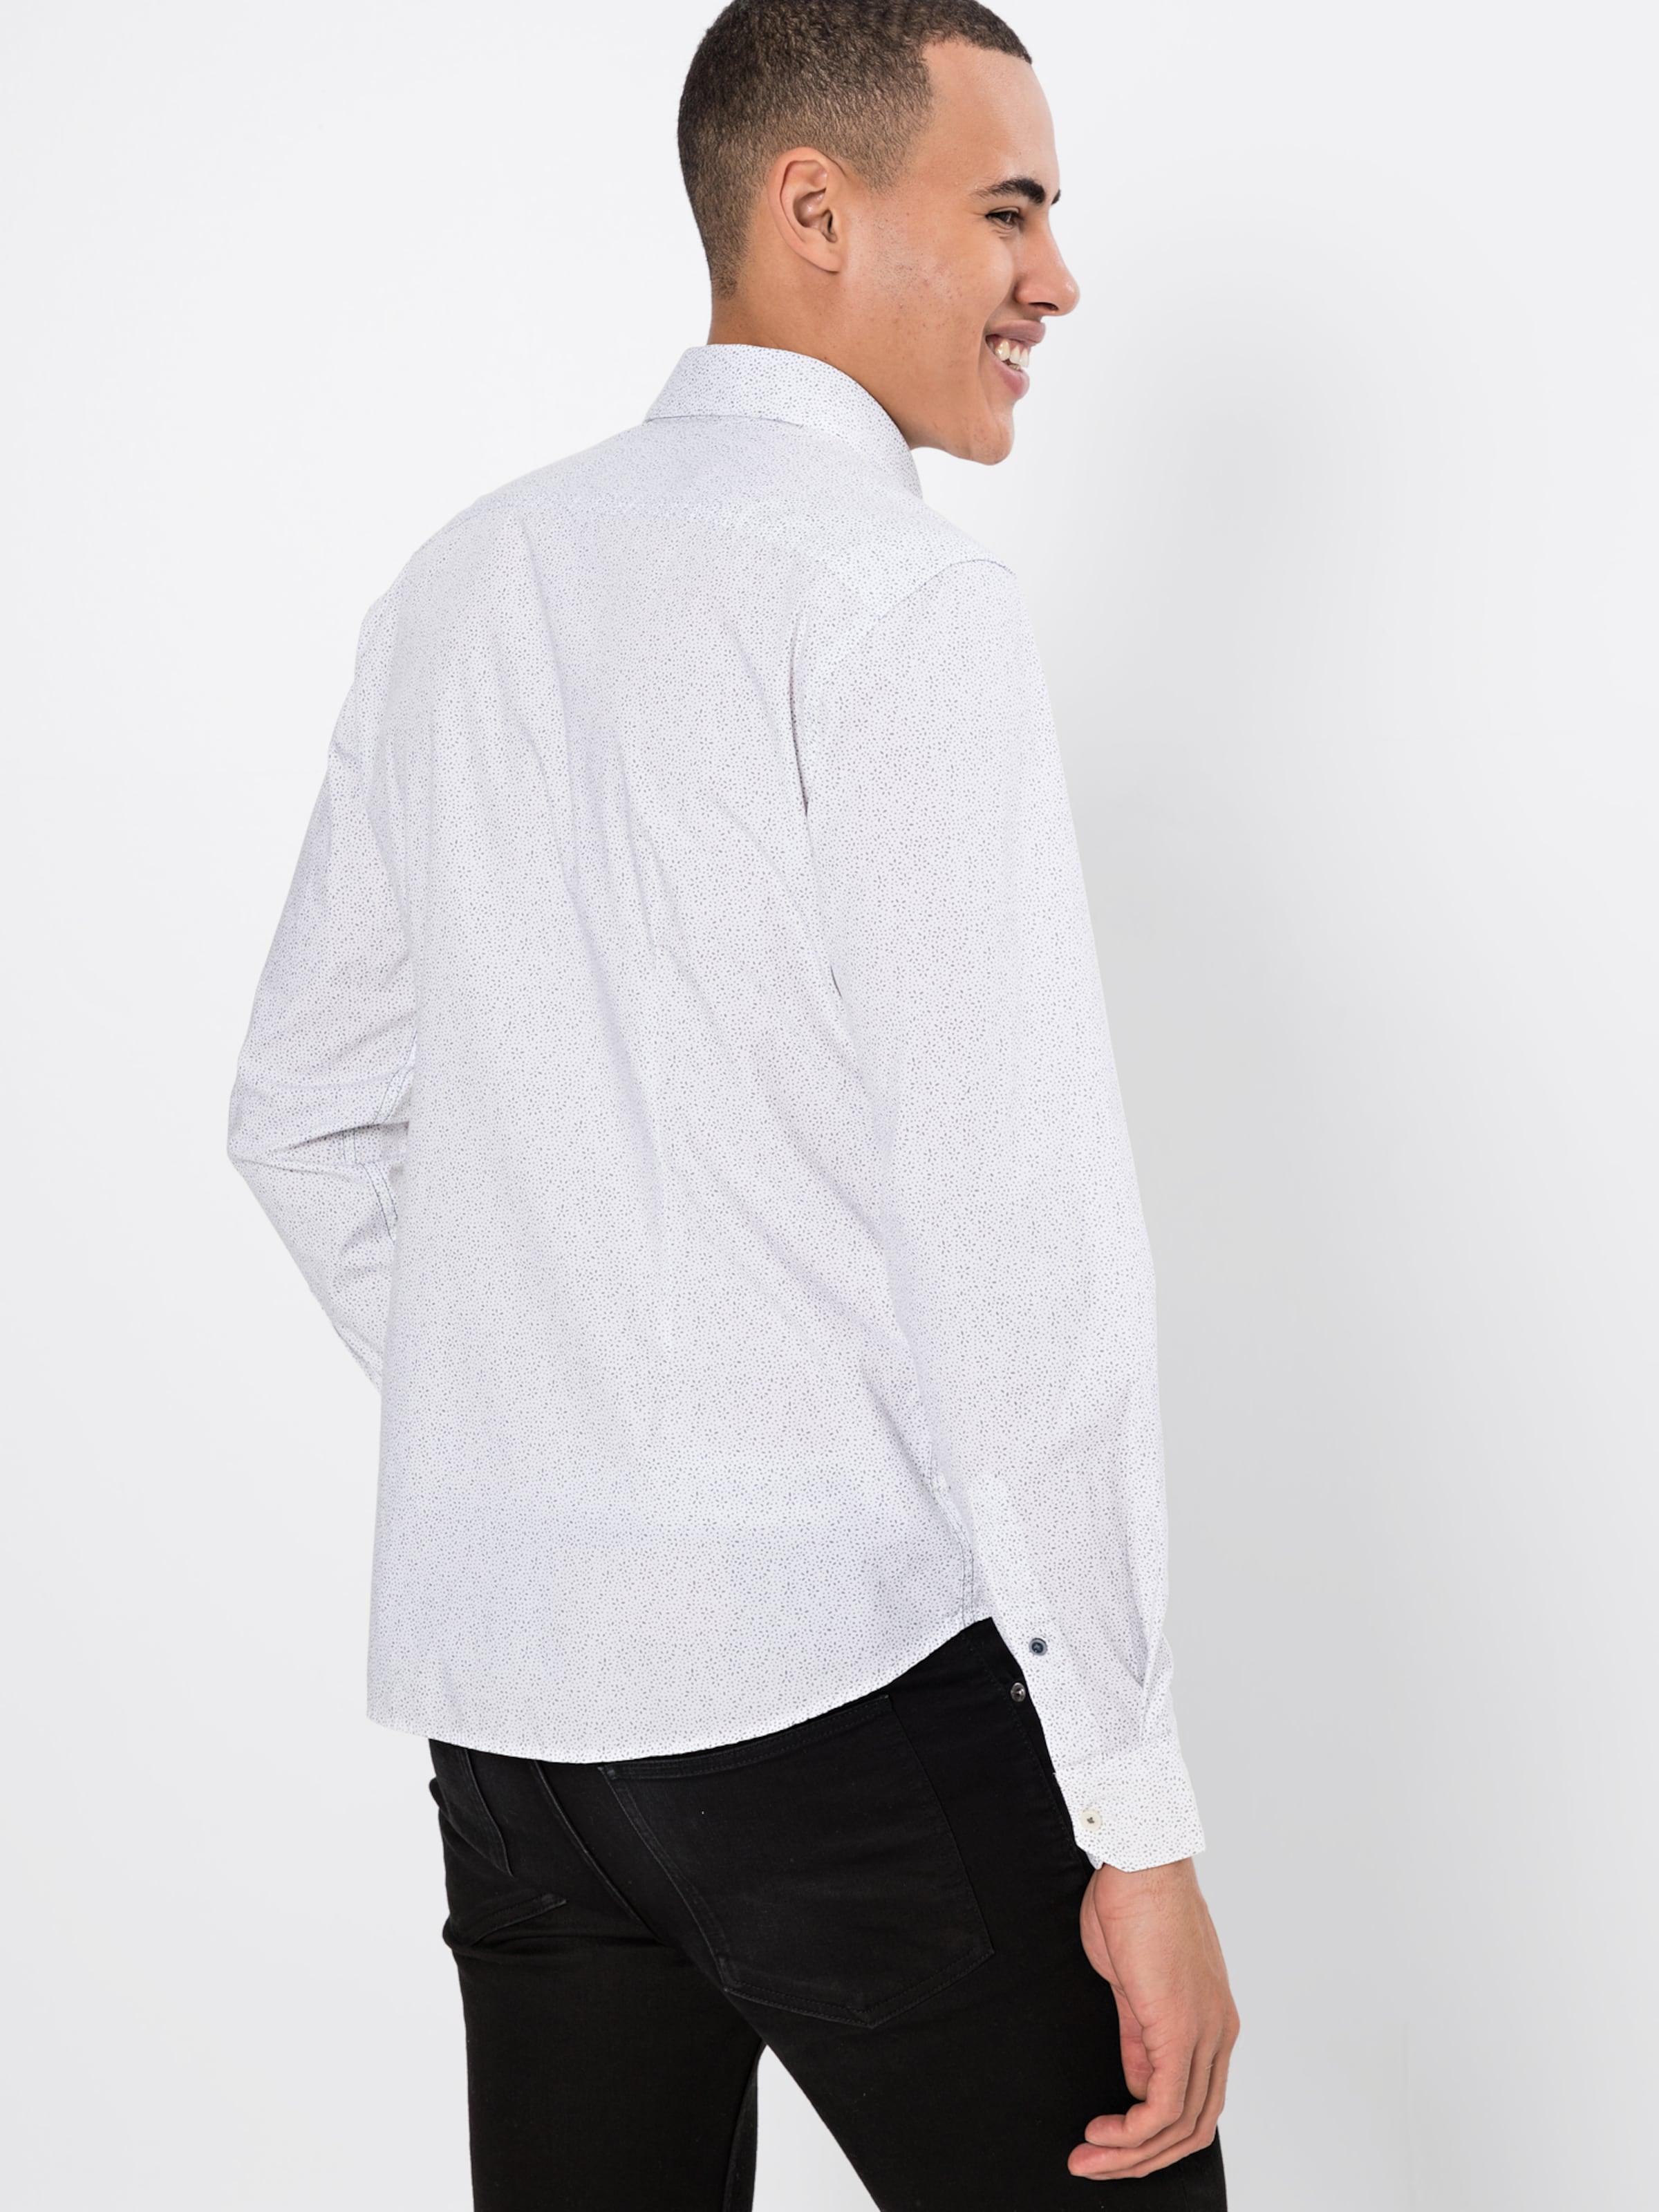 oliver oliver In In Hemd Hemd Weiß Weiß Hemd S In oliver S S 0nw8vmN